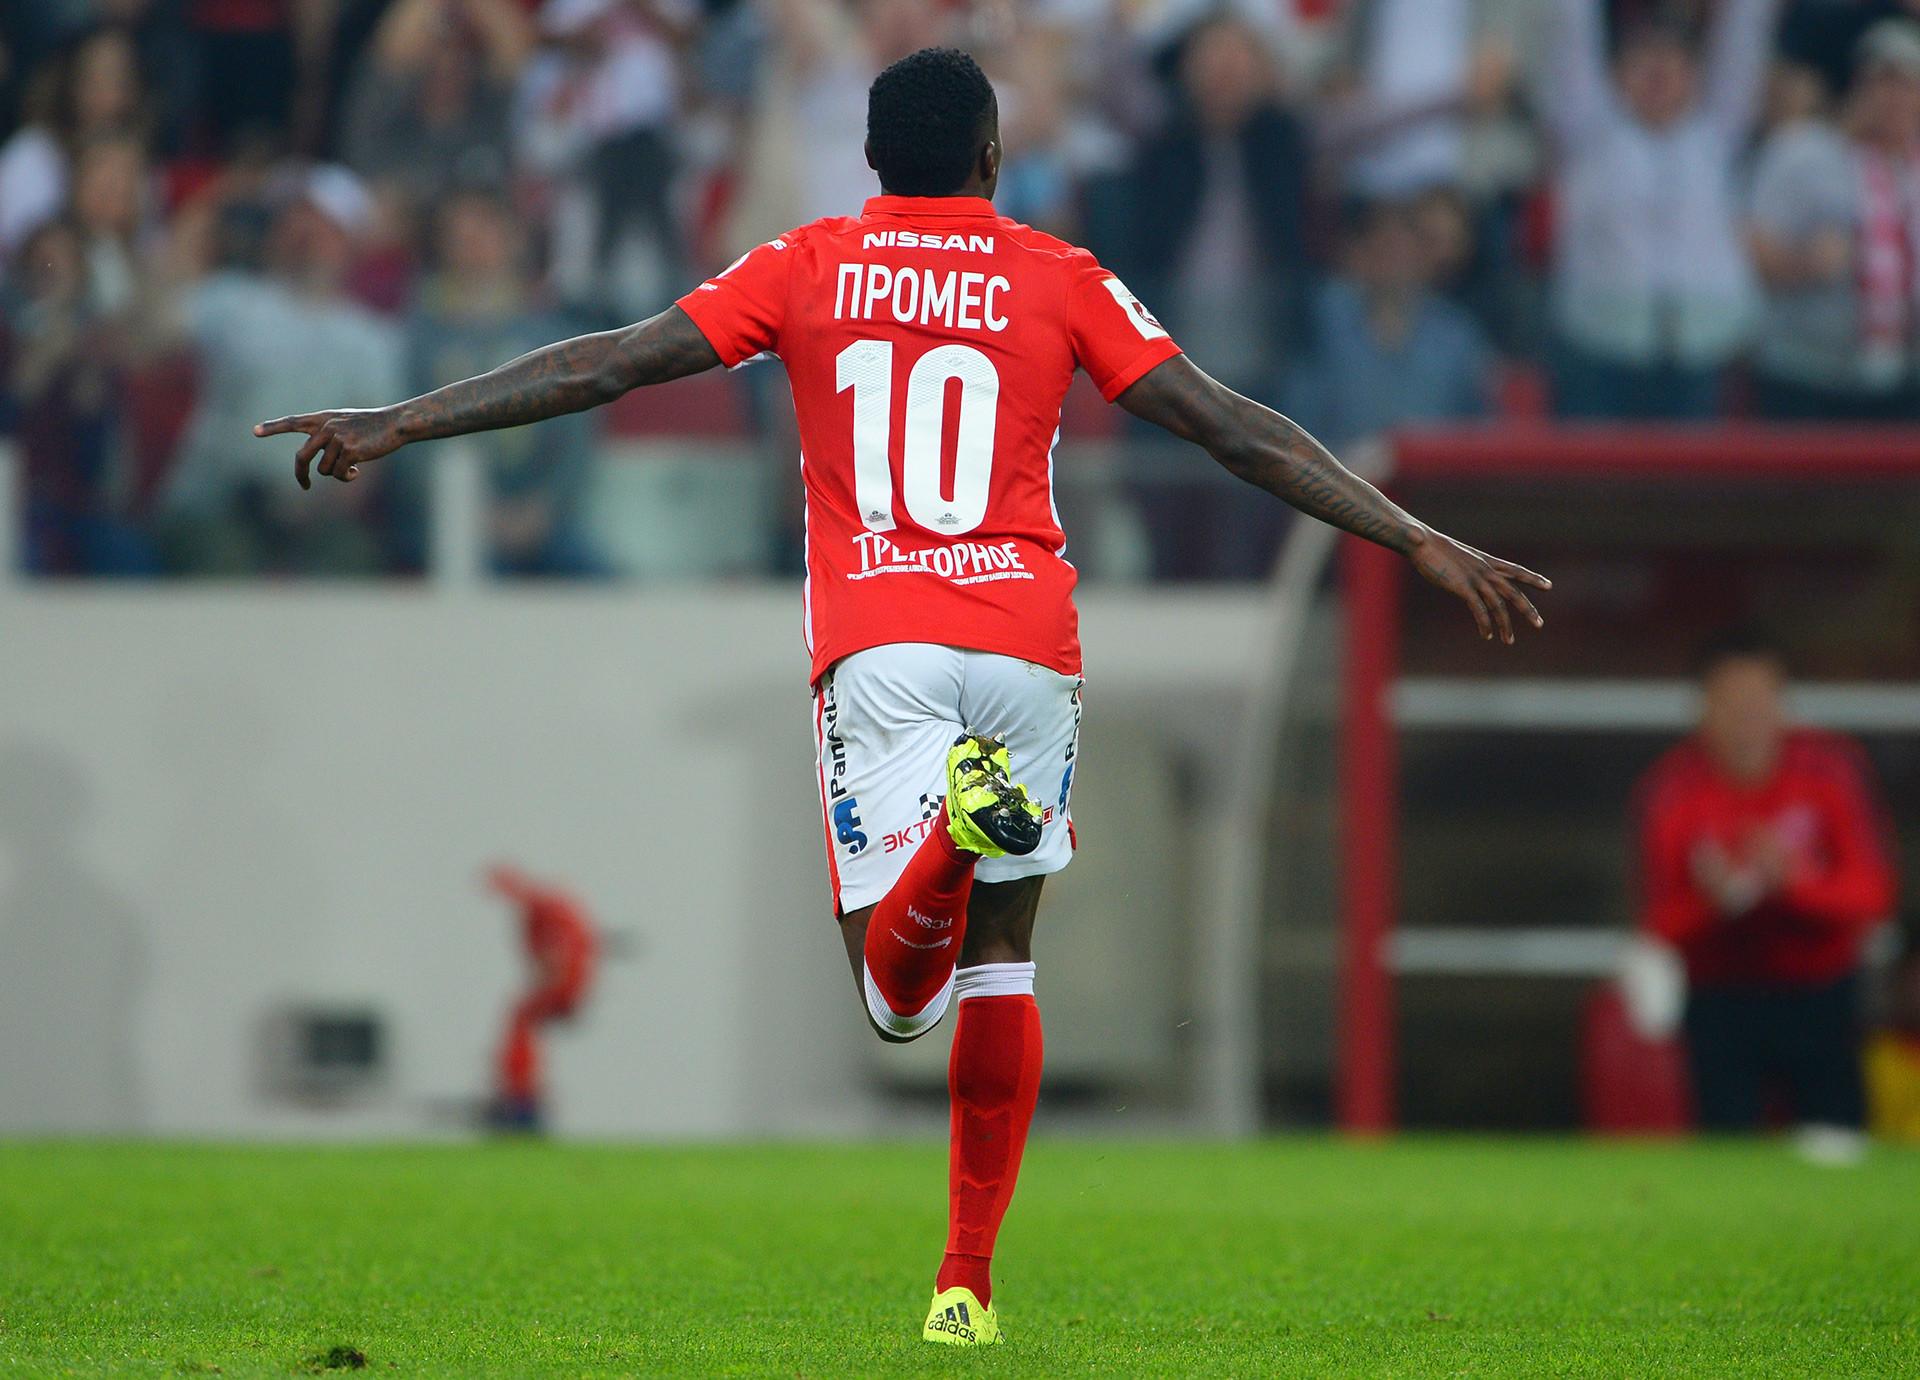 Gelandang kelahiran Belanda, Quincy Promes, merupakan pemain asing yang luar biasa di Liga Primer Rusia. Ia telah mencetak 58 gol dalam 115 pertandingan untuk Spartak Moskow.